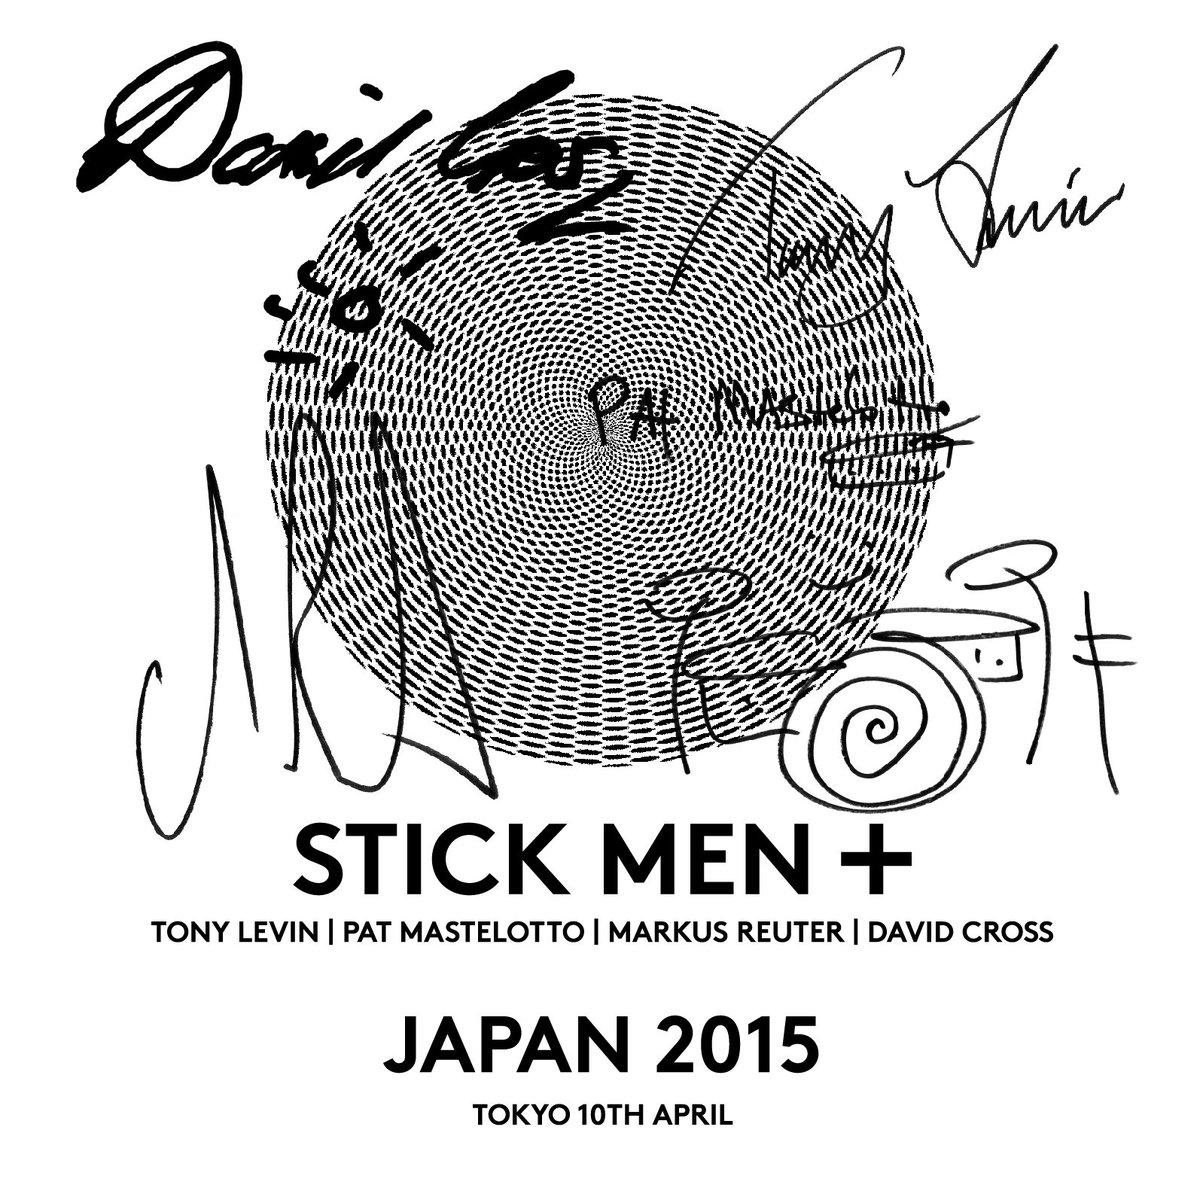 stick men online  stick man fight online game apk download